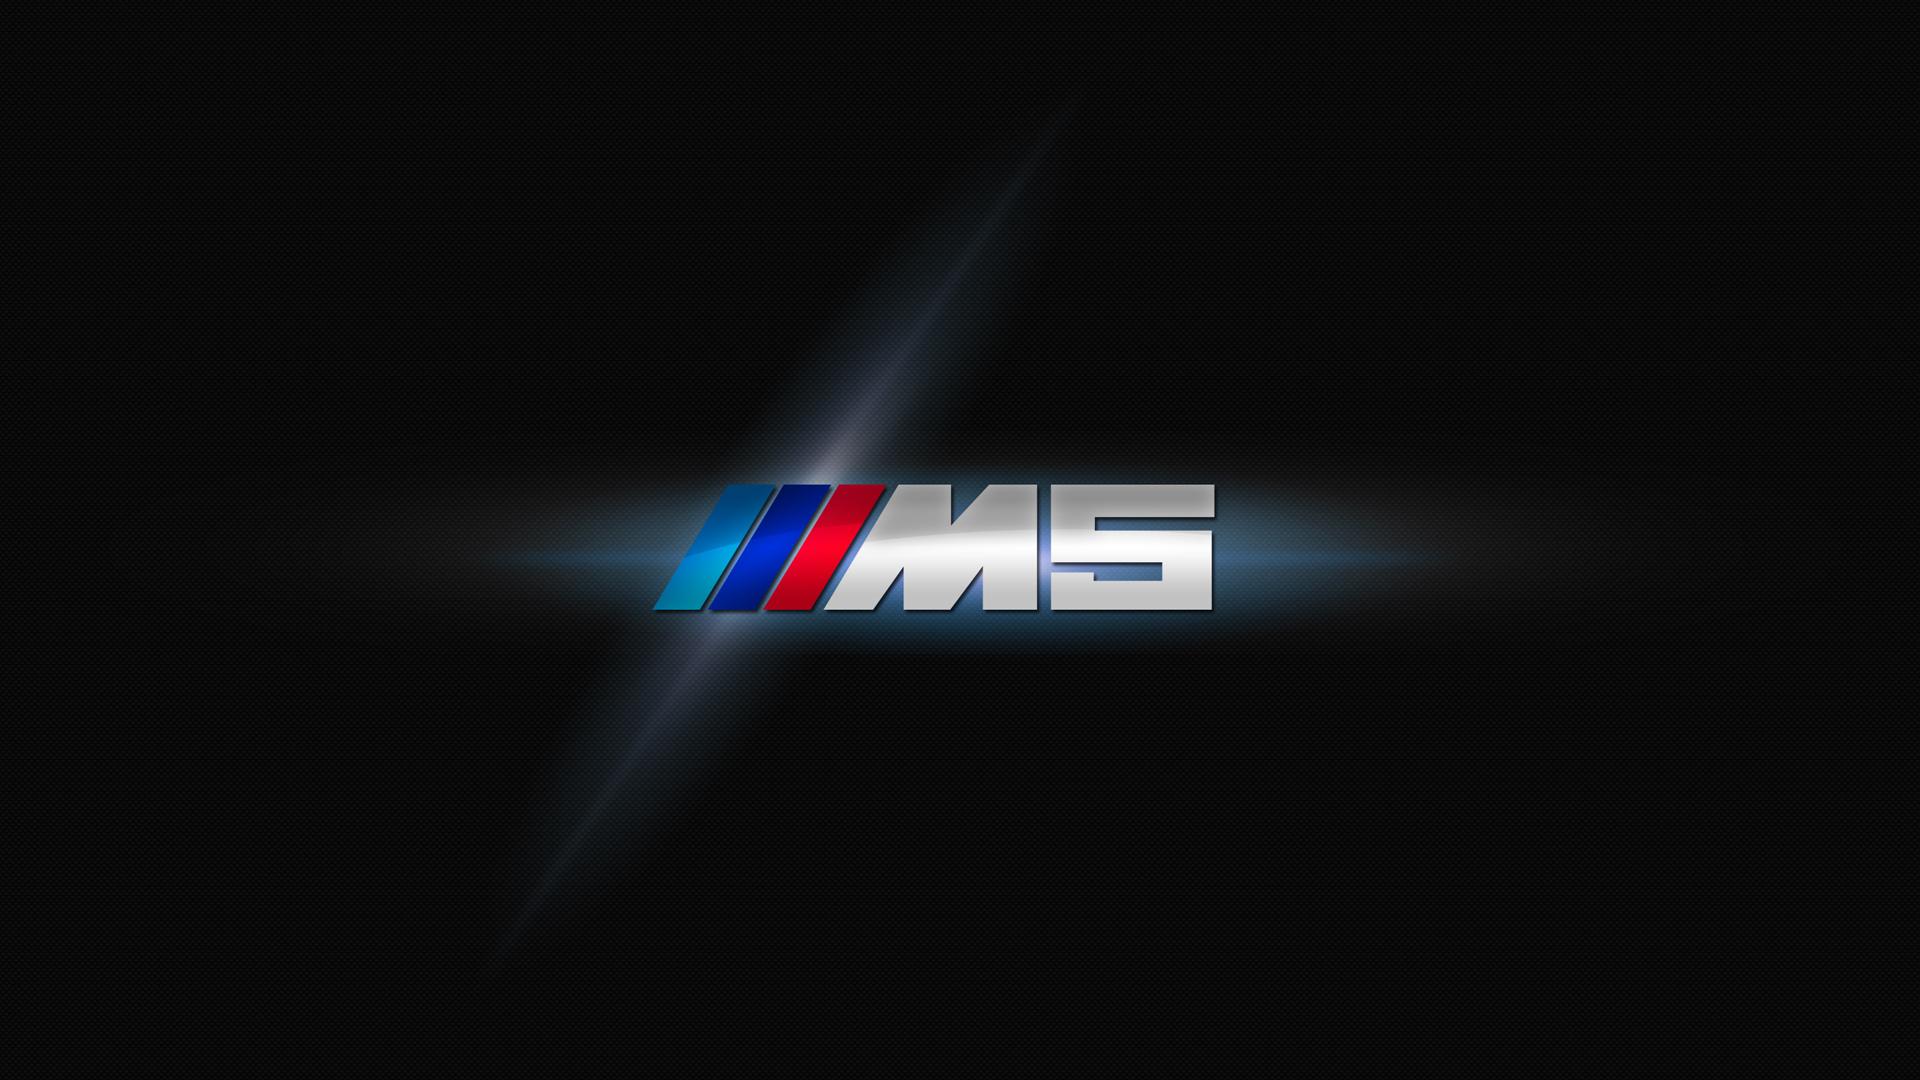 Download Free BMW Logo Background